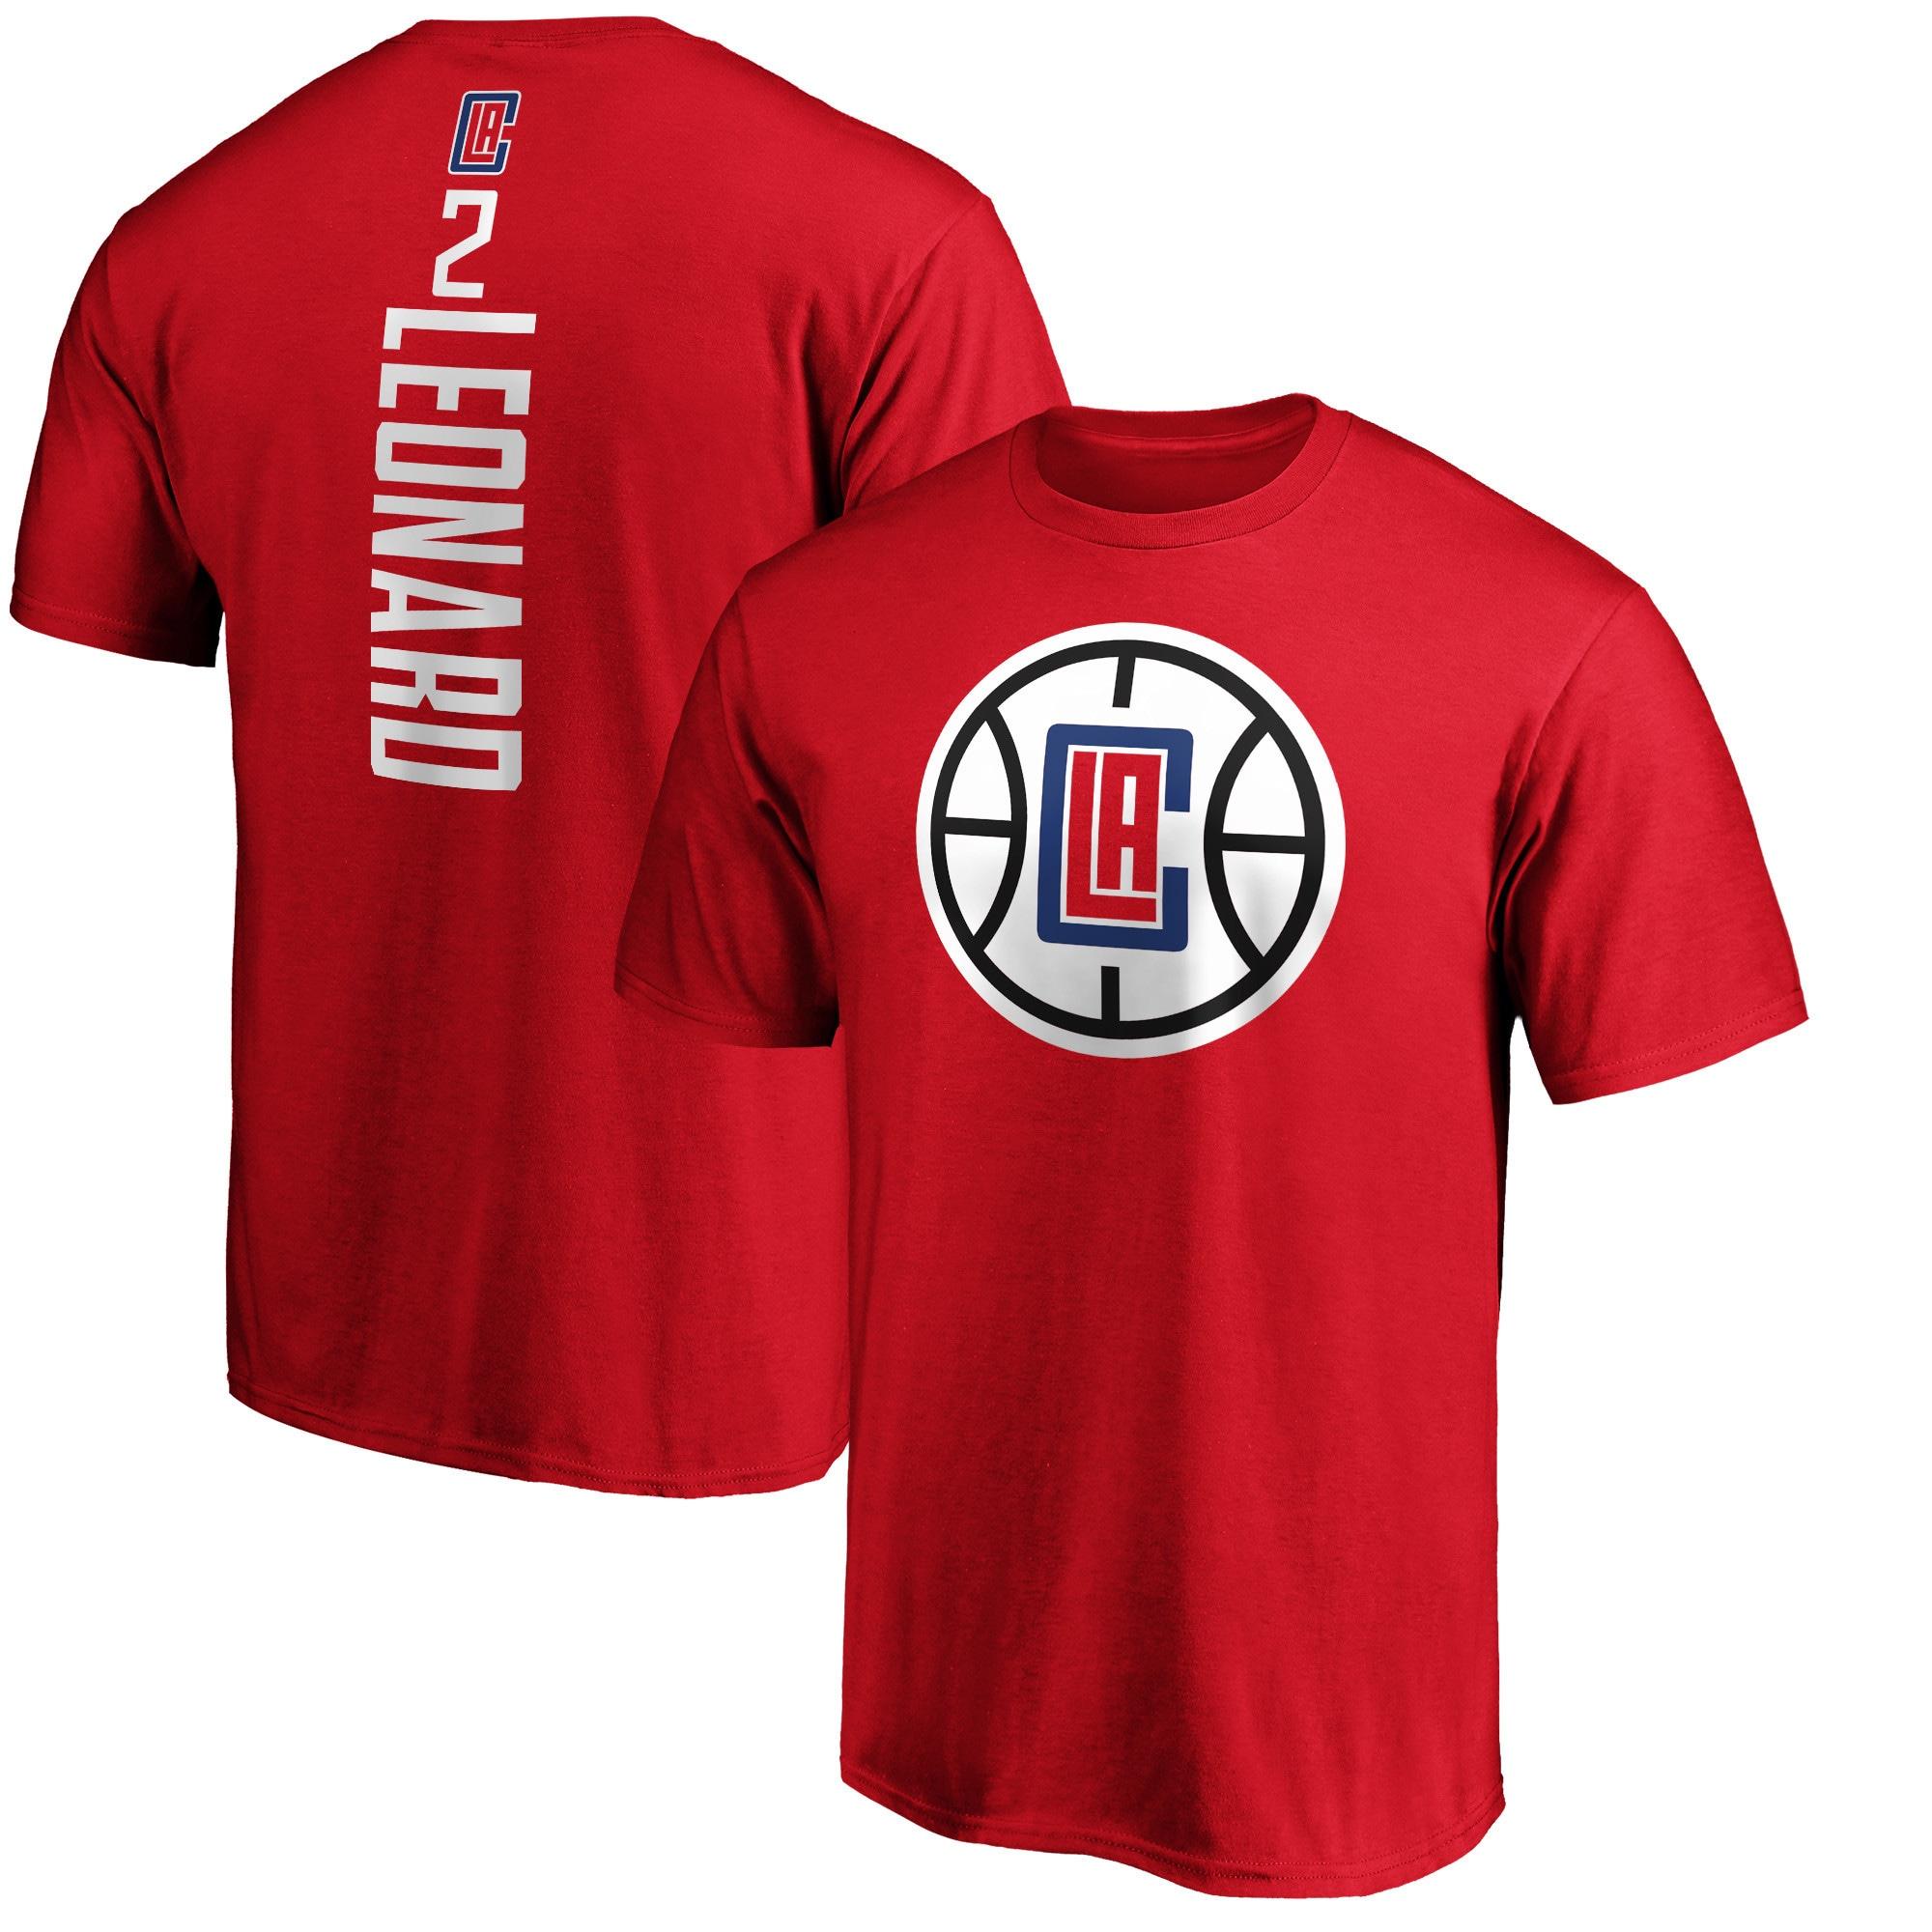 Kawhi Leonard LA Clippers Fanatics Branded Team Playmaker Name & Number T-Shirt - Red